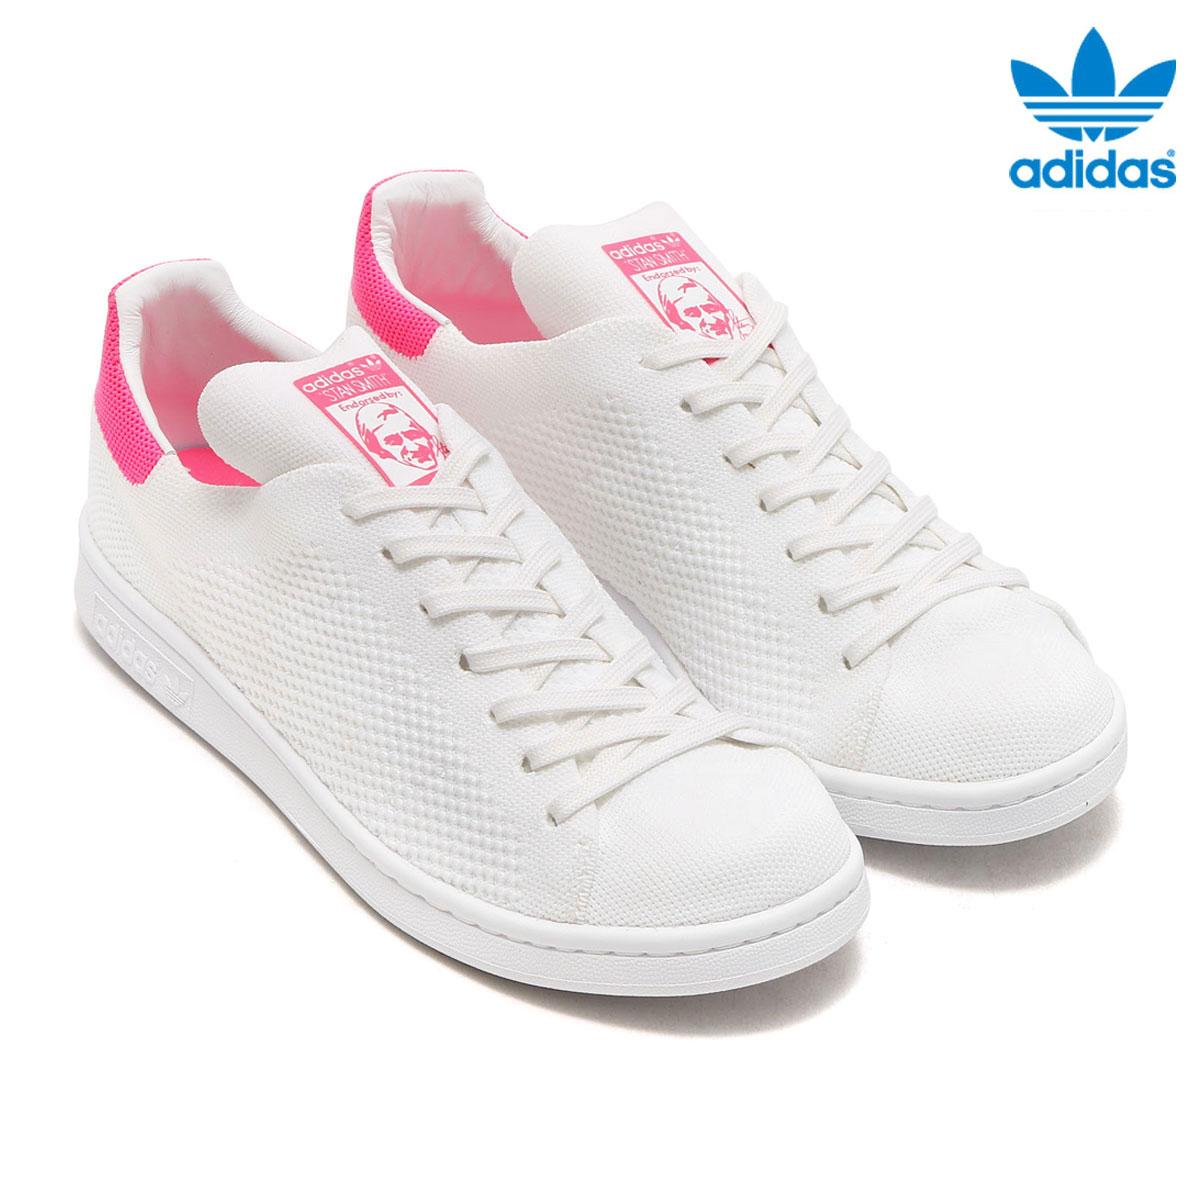 19ad4bf15eade atmos pink  adidas Originals STAN SMITH PK (Adidas originals Stan Smith PK)  (Running White Running White Ultra Pop) 17FW-I